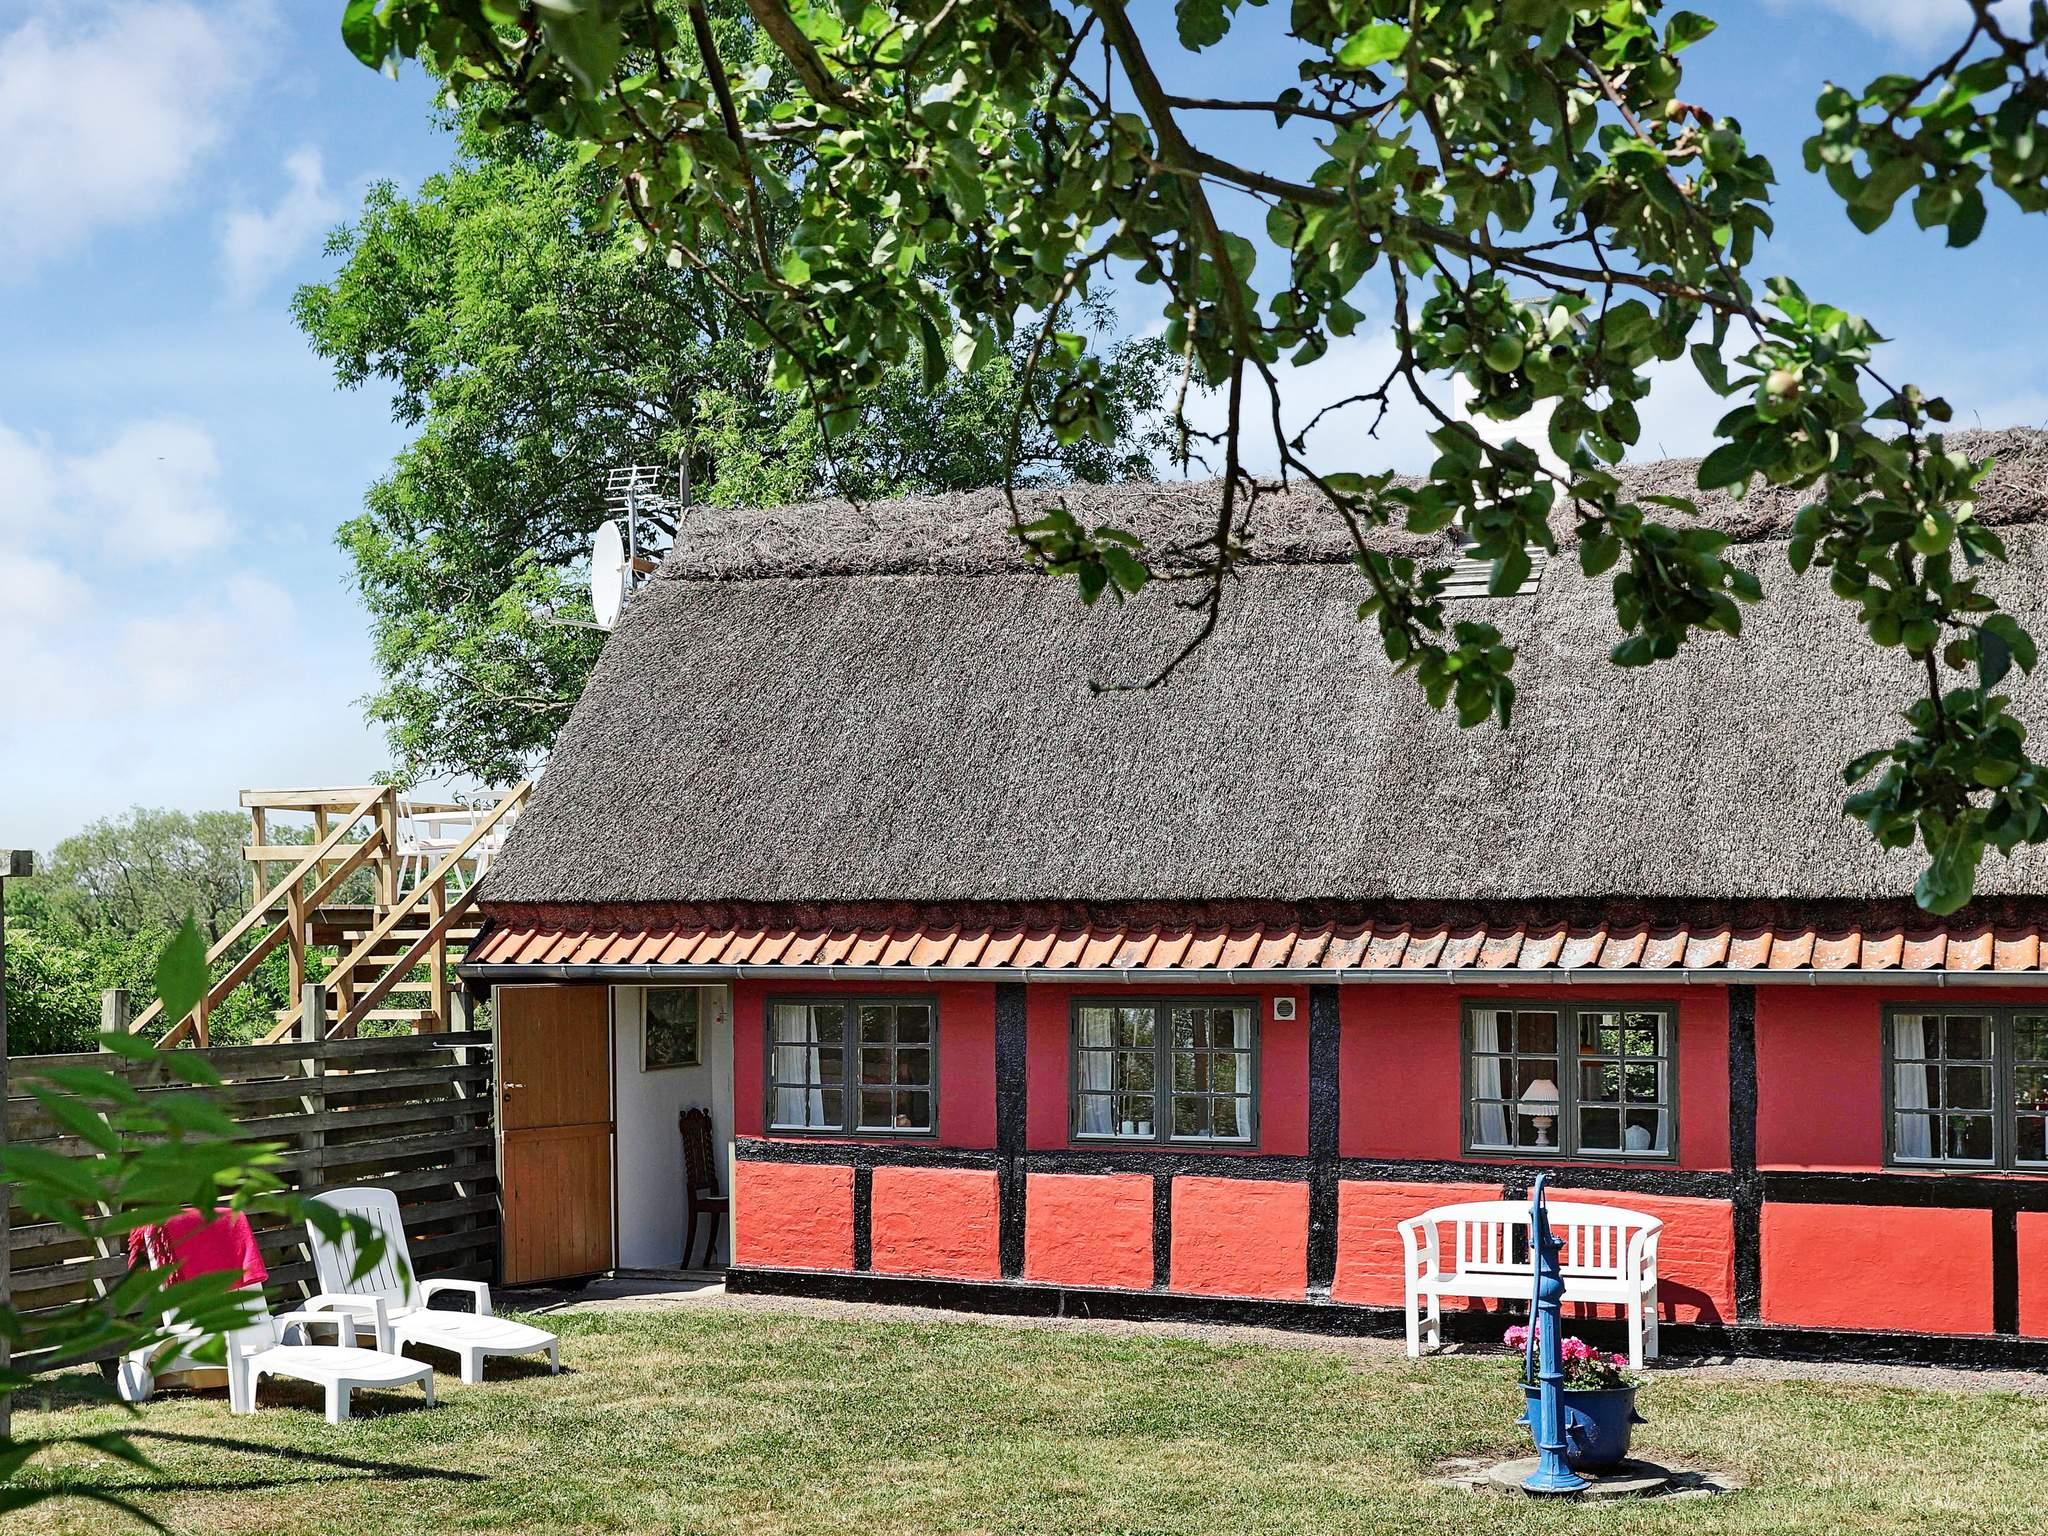 Ferienhaus Balka Strand (81872), Balke, , Bornholm, Dänemark, Bild 15